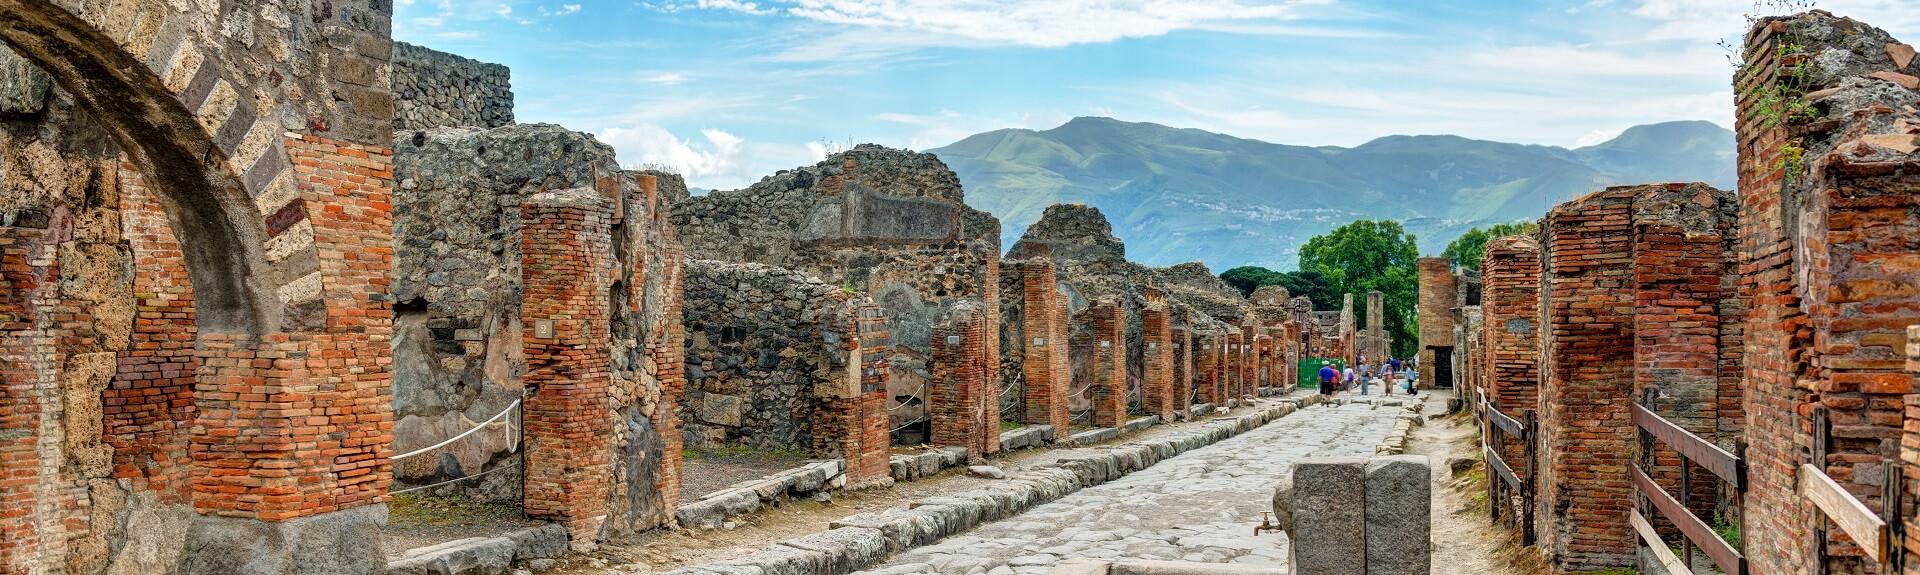 2 hour Pompeii Guided Walking Tour €45